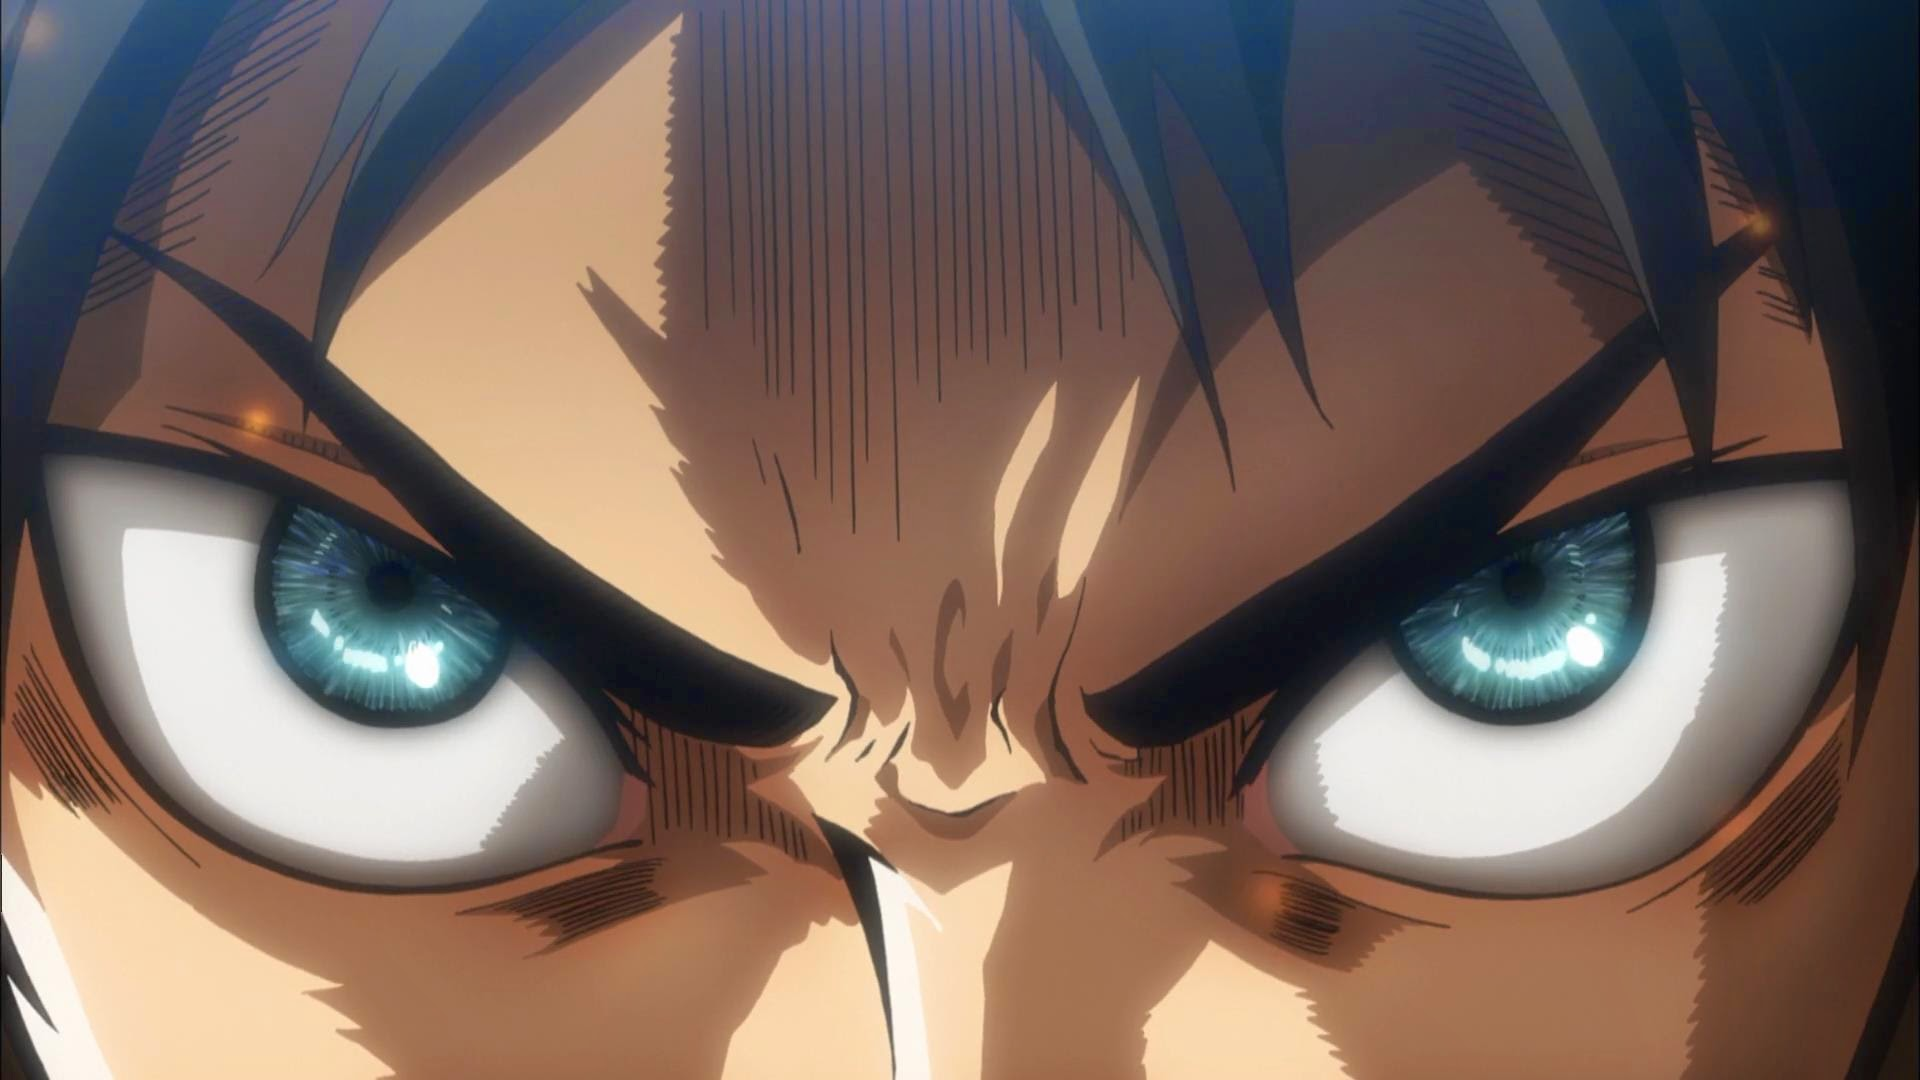 http://img3.wikia.nocookie.net/__cb20141019185852/clubpenguinpookie/images/4/46/Shingeki-4-34-eren-jaeger-eyes.jpg